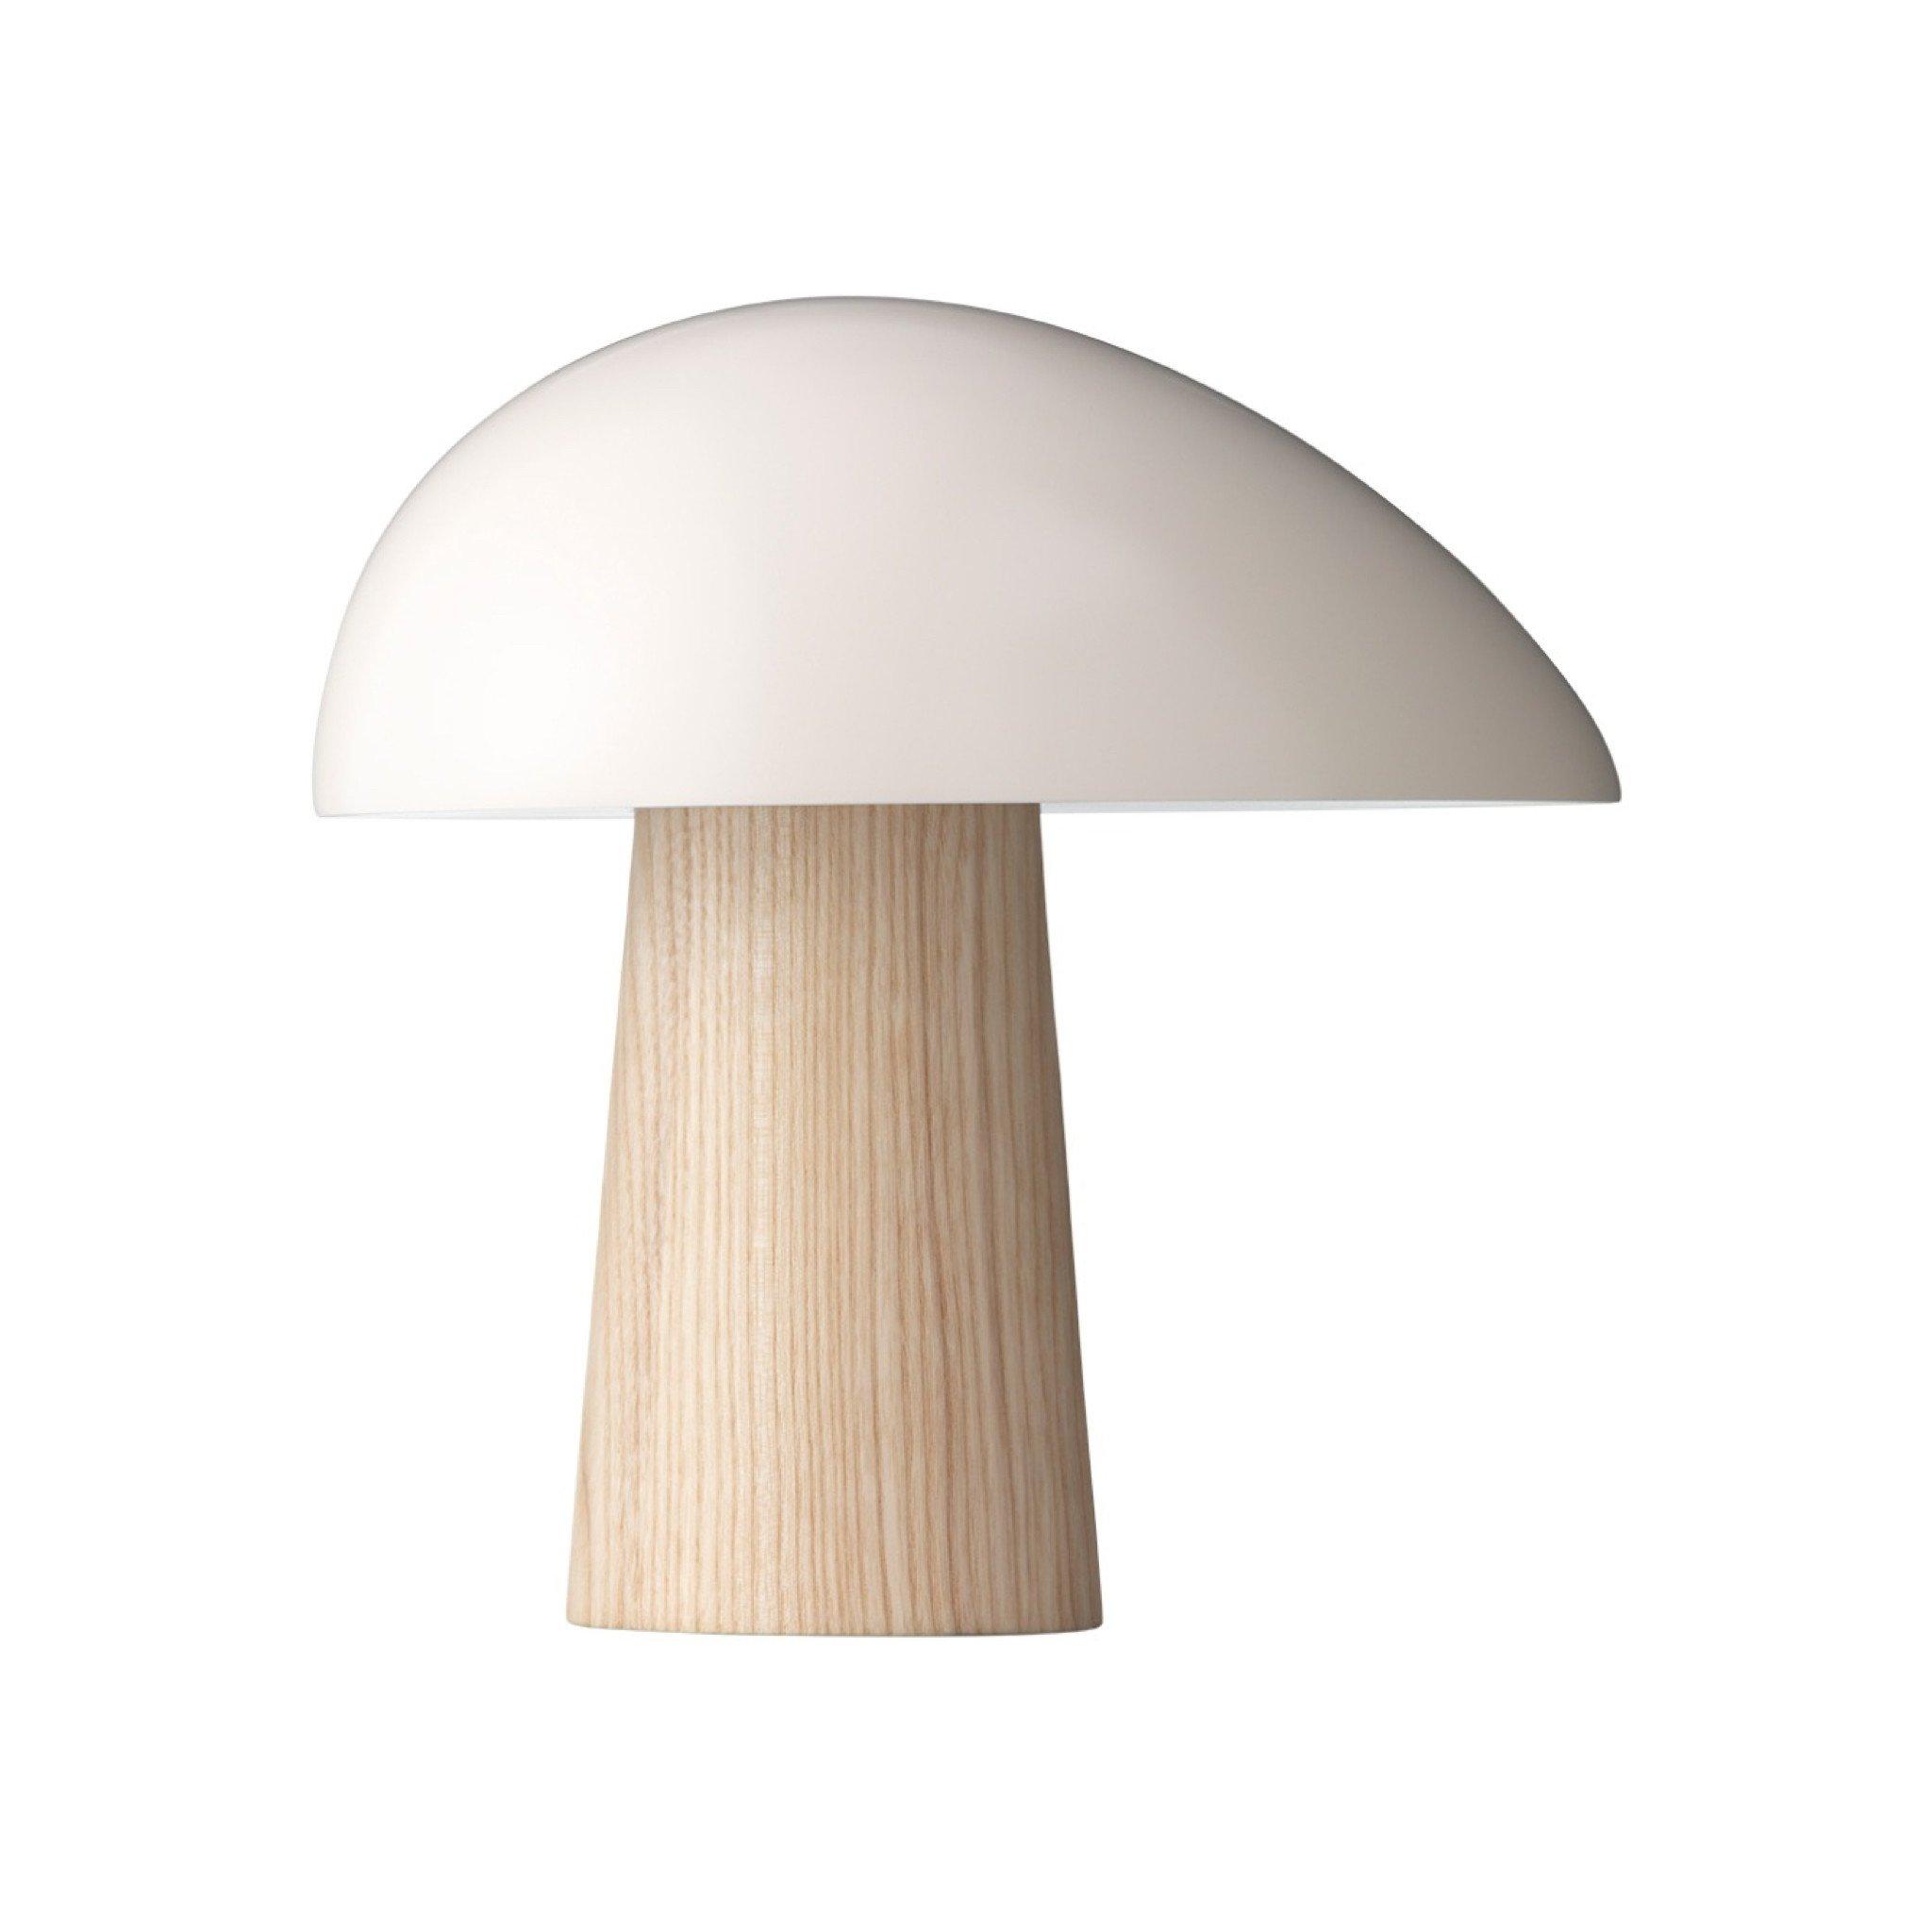 Lightyears night owl table lamp nicholai wiig hansen owo online add to wishlist loading aloadofball Choice Image